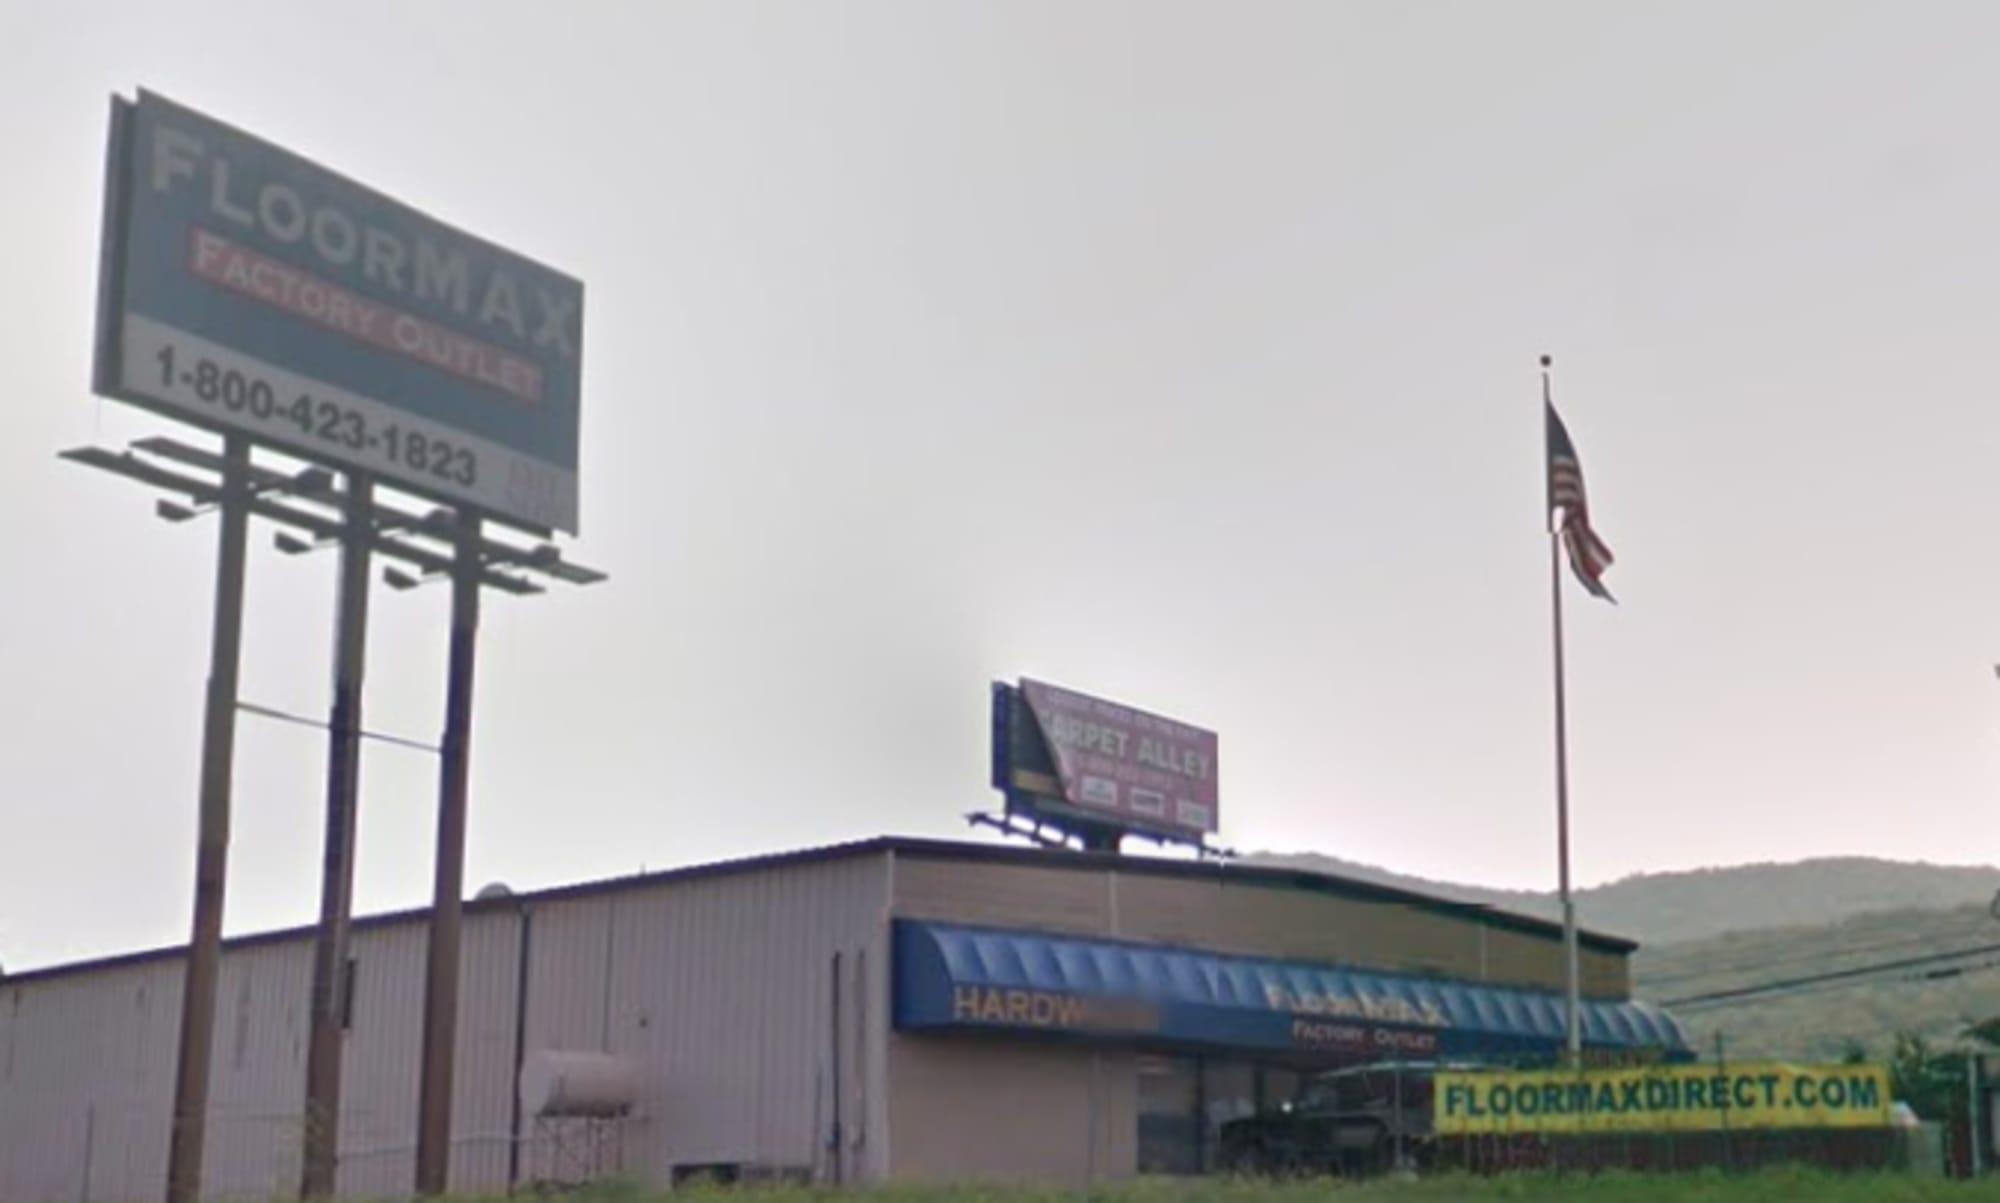 FloorMax Direct - 3021 North Dug Gap Rd SW Dalton, GA 30720